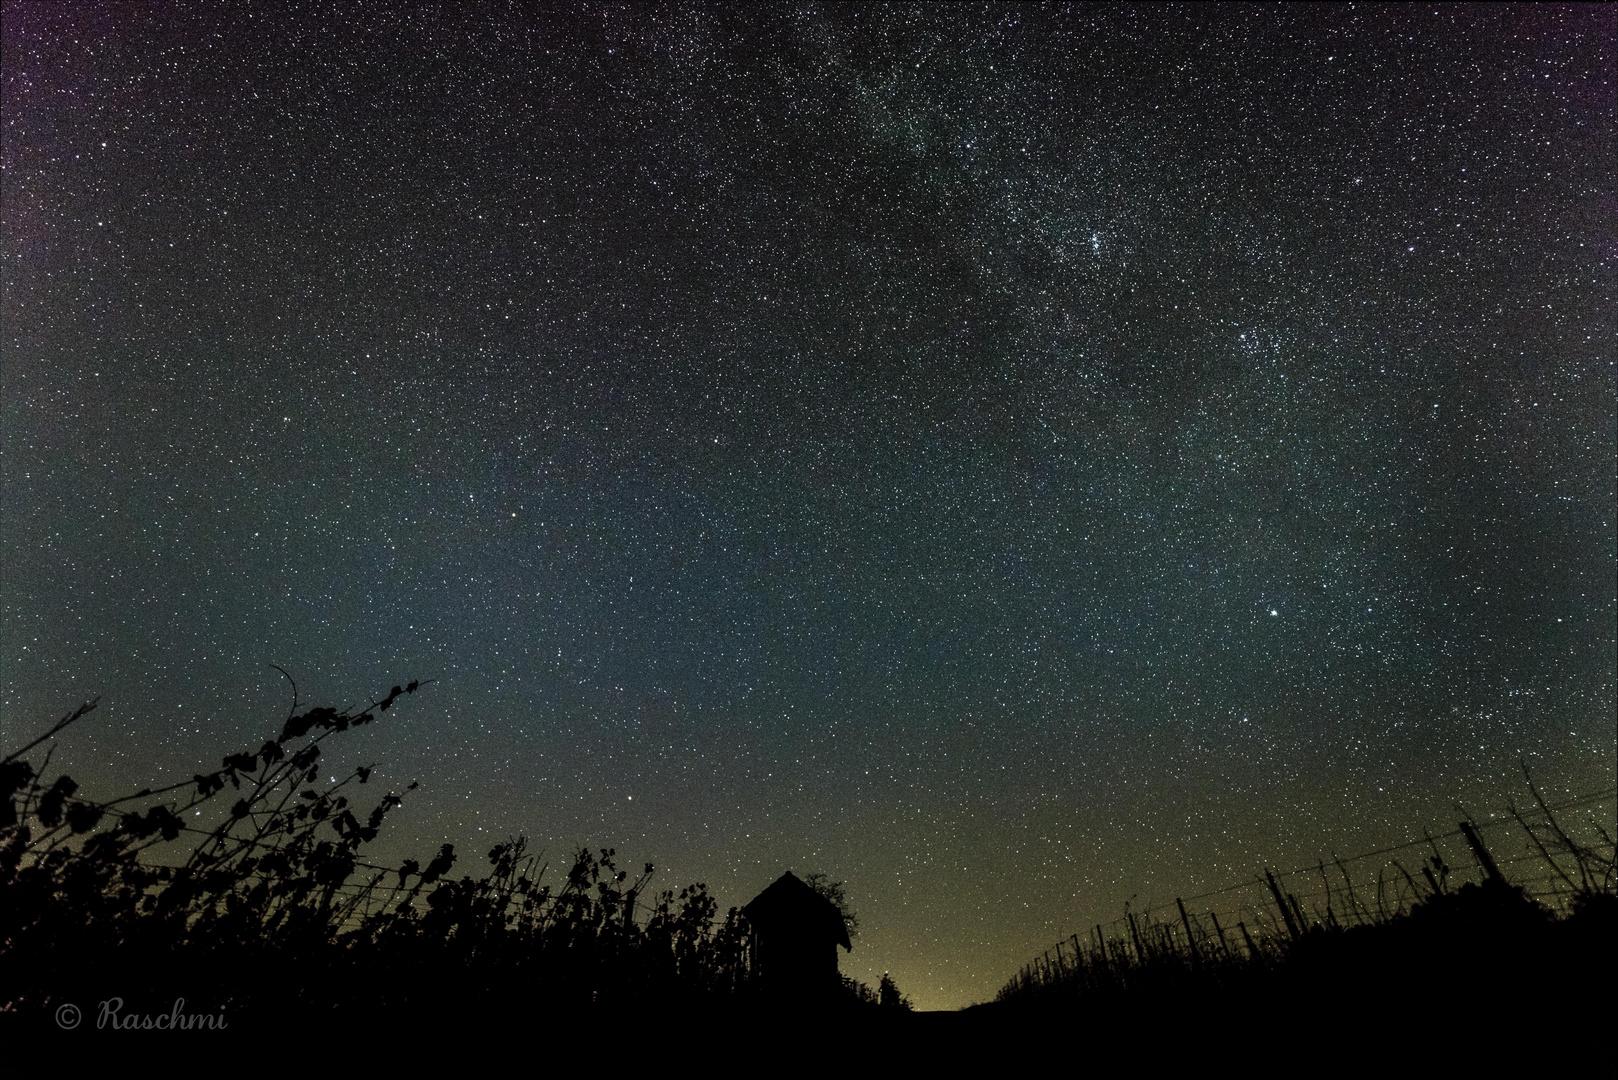 Sternenhimmel Foto & Bild   astrofotografie, himmel & universum ...